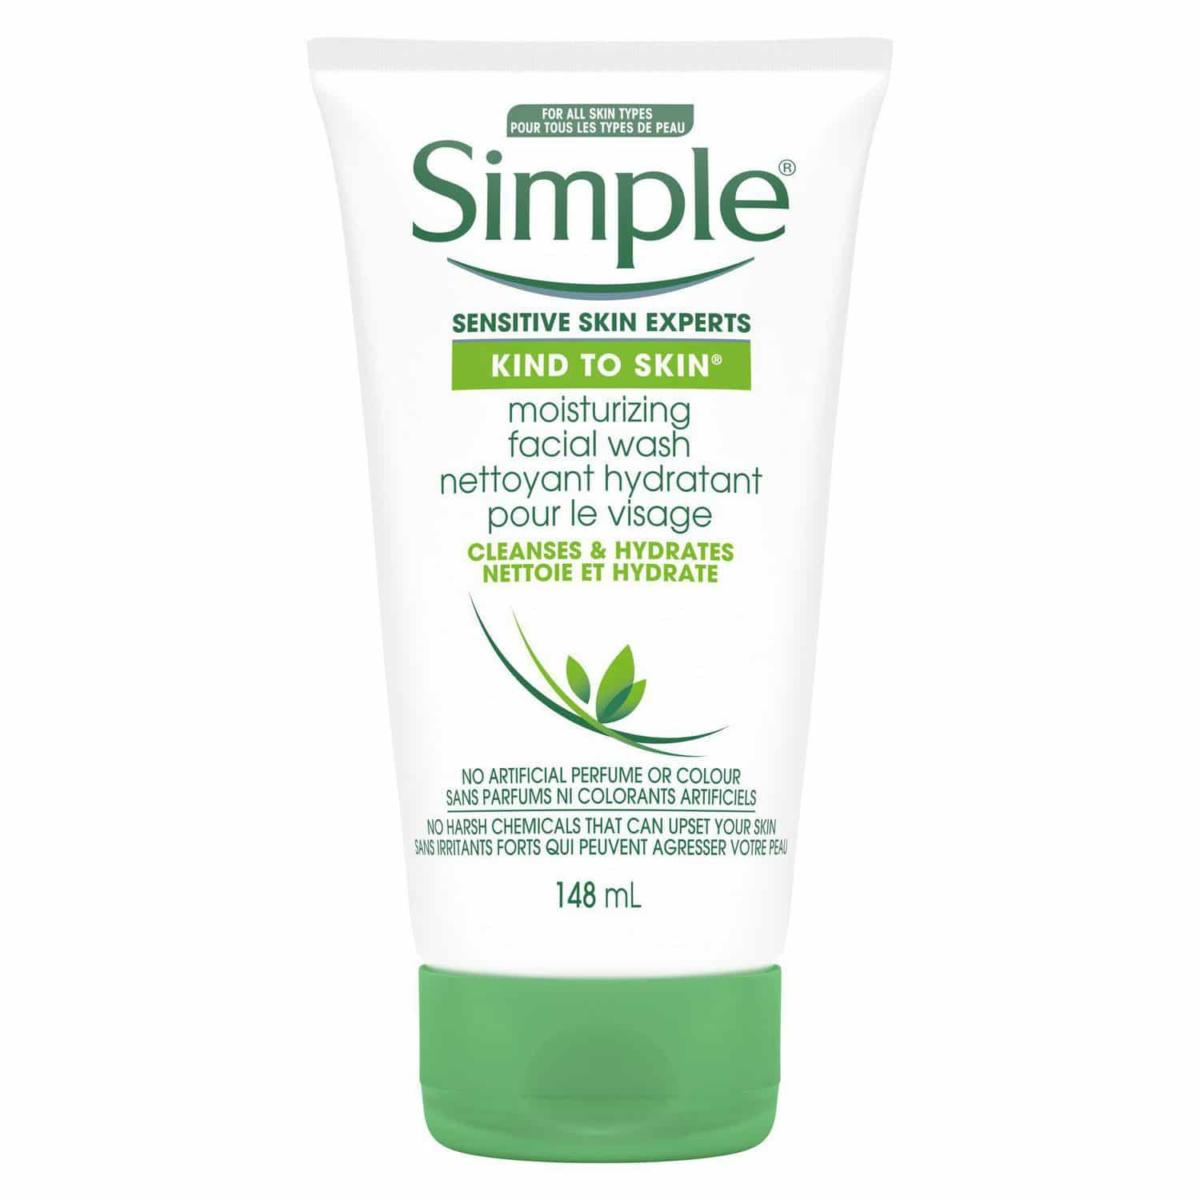 Simple Moisturizing Face Wash